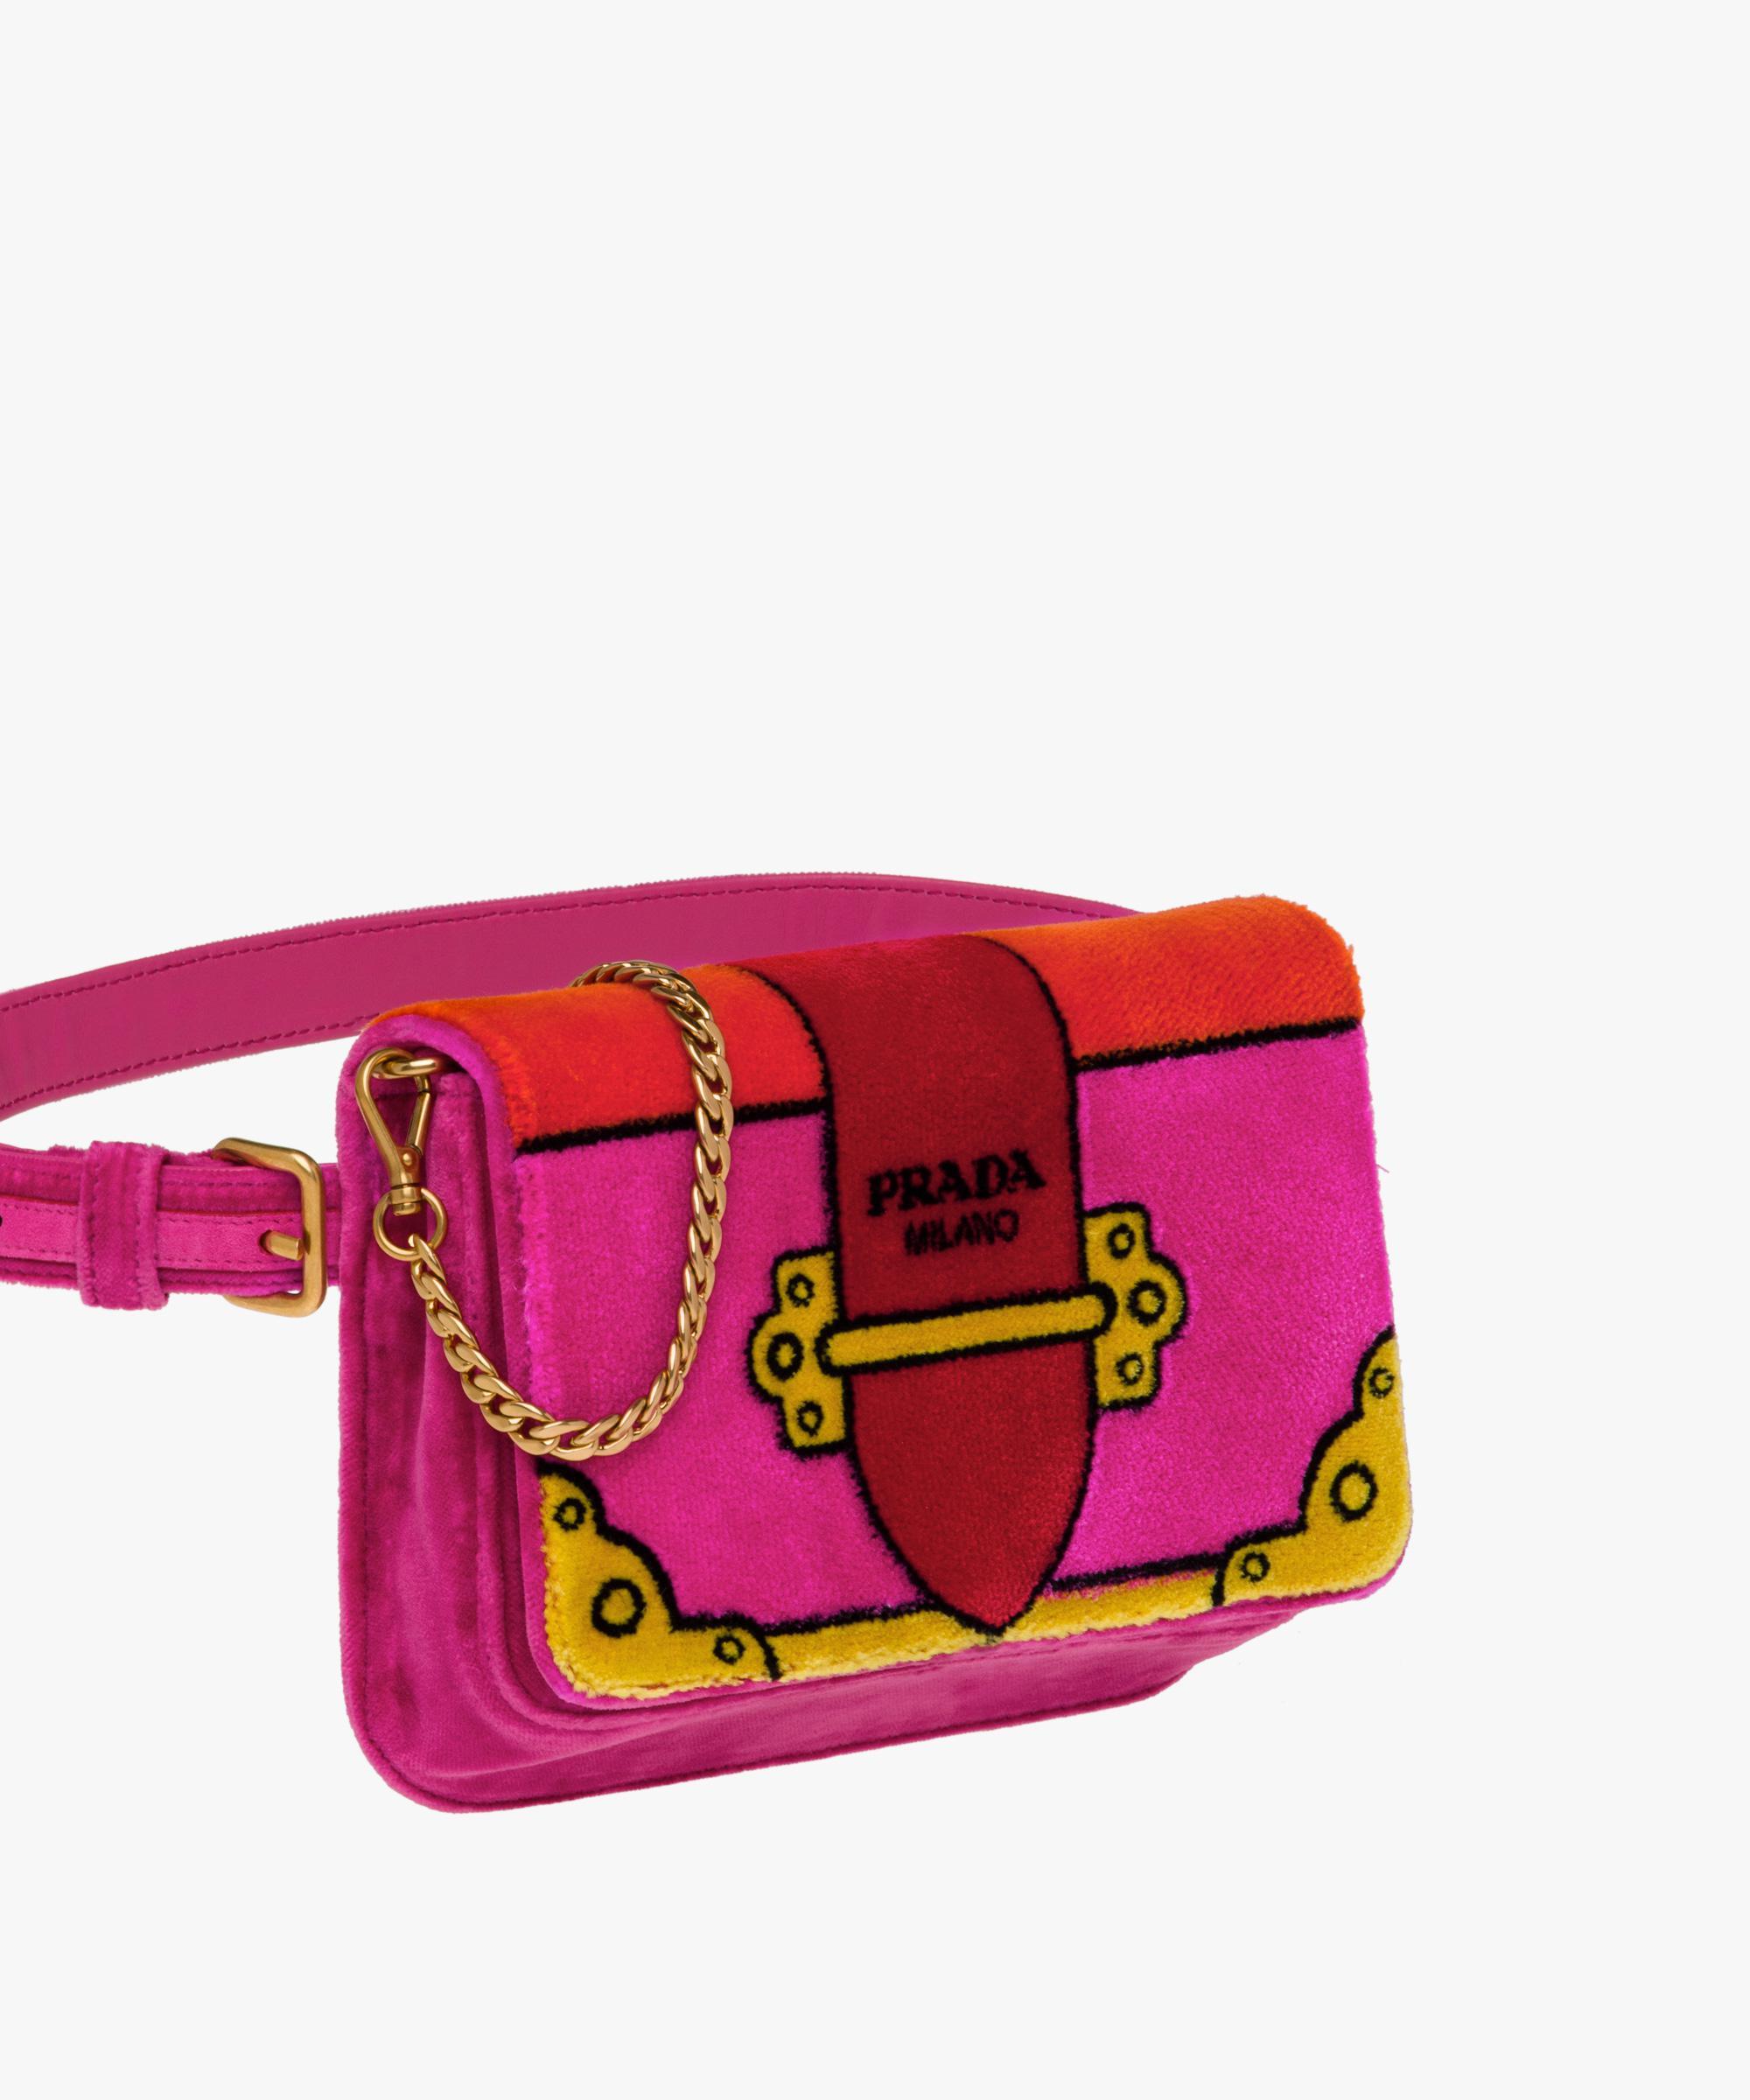 8a1722c66fef ... cheap lyst prada velvet bag in pink 2c551 5029a